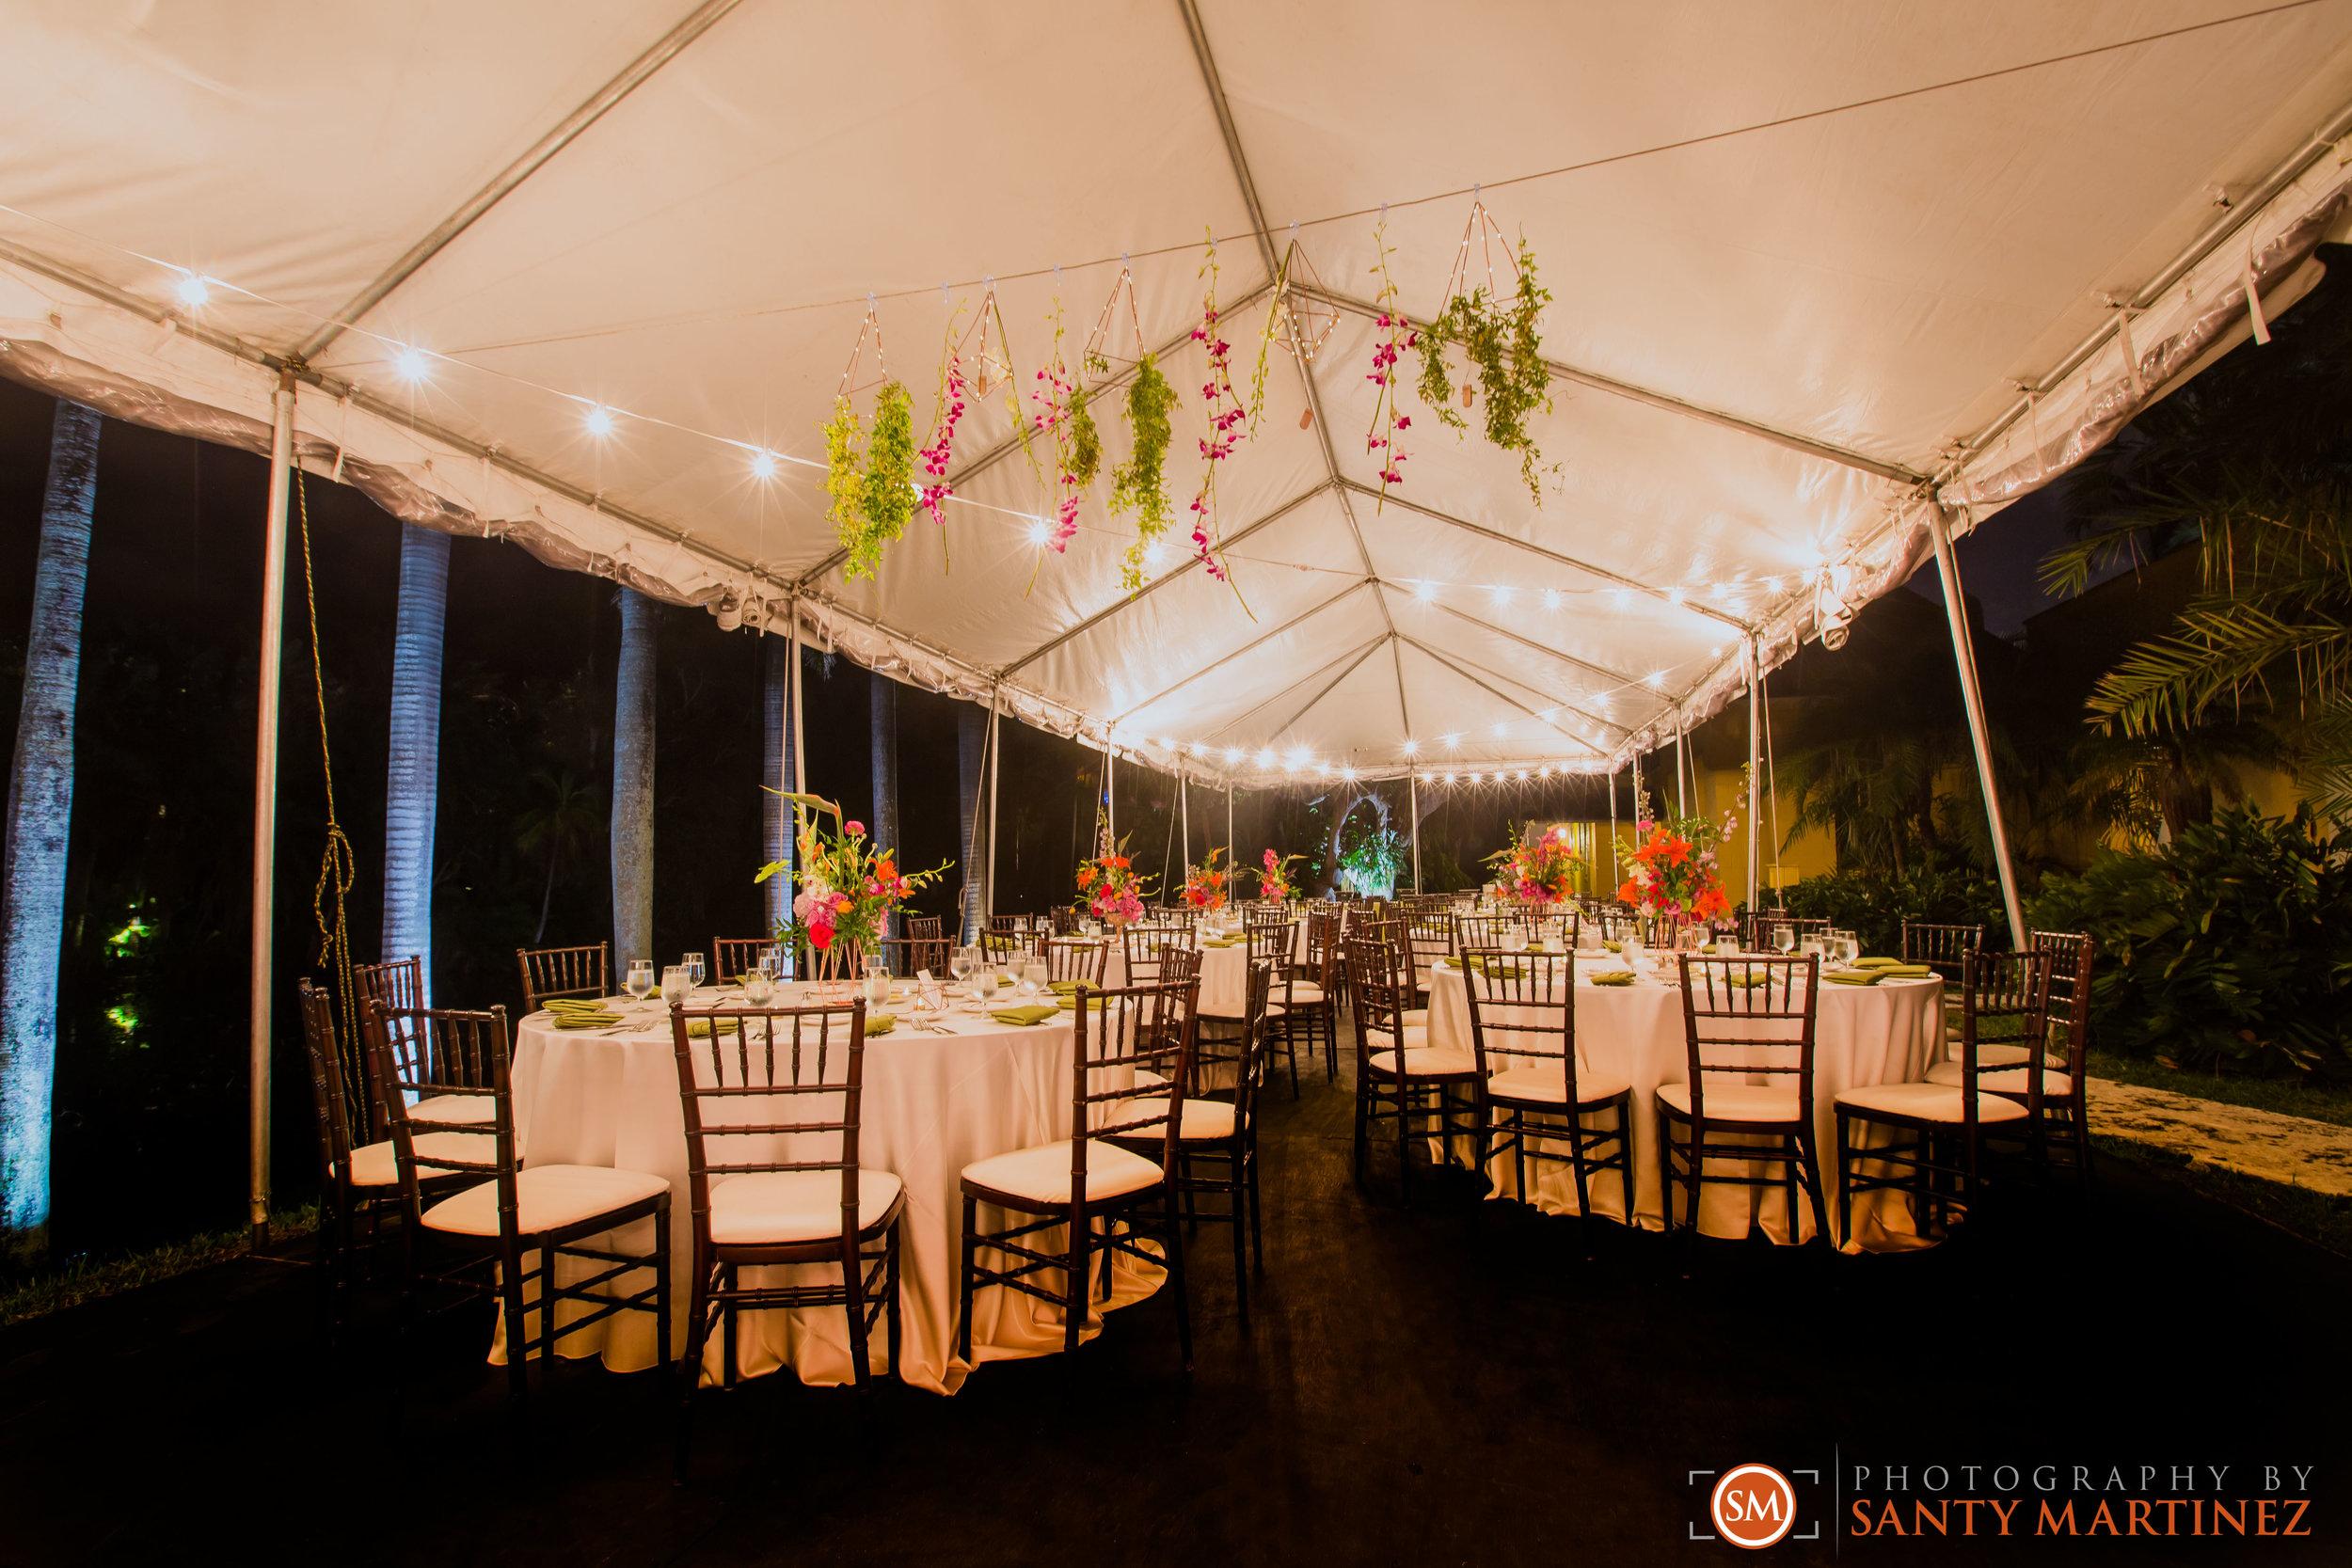 Wedding Bonnet House - Photography by Santy Martinez-36.jpg